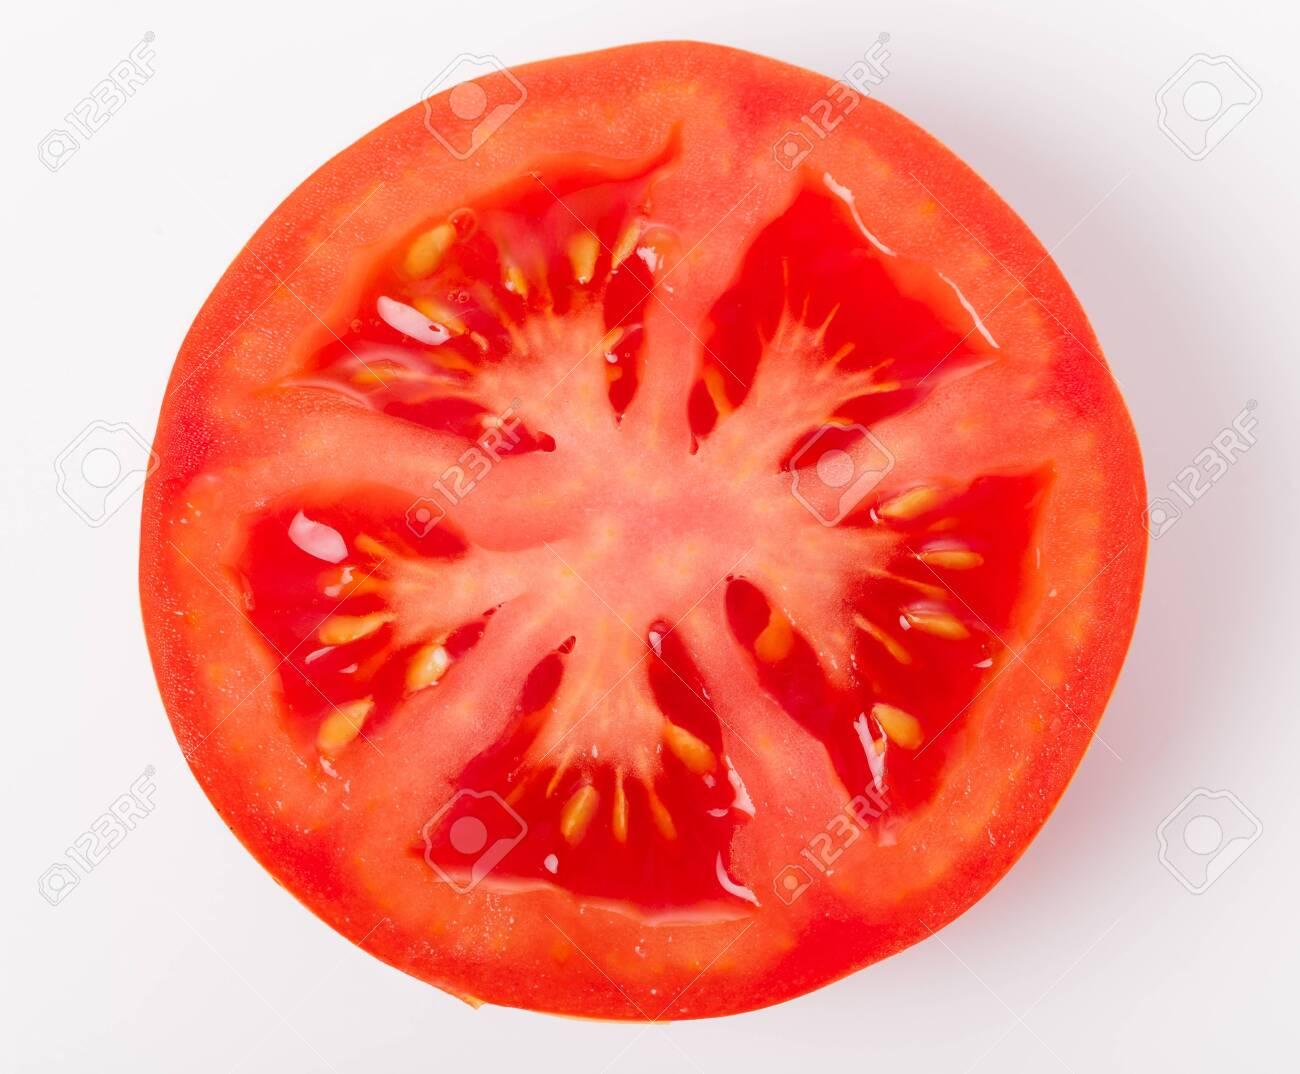 Slice of fresh tomato closeup, isolated on white, - 148355191